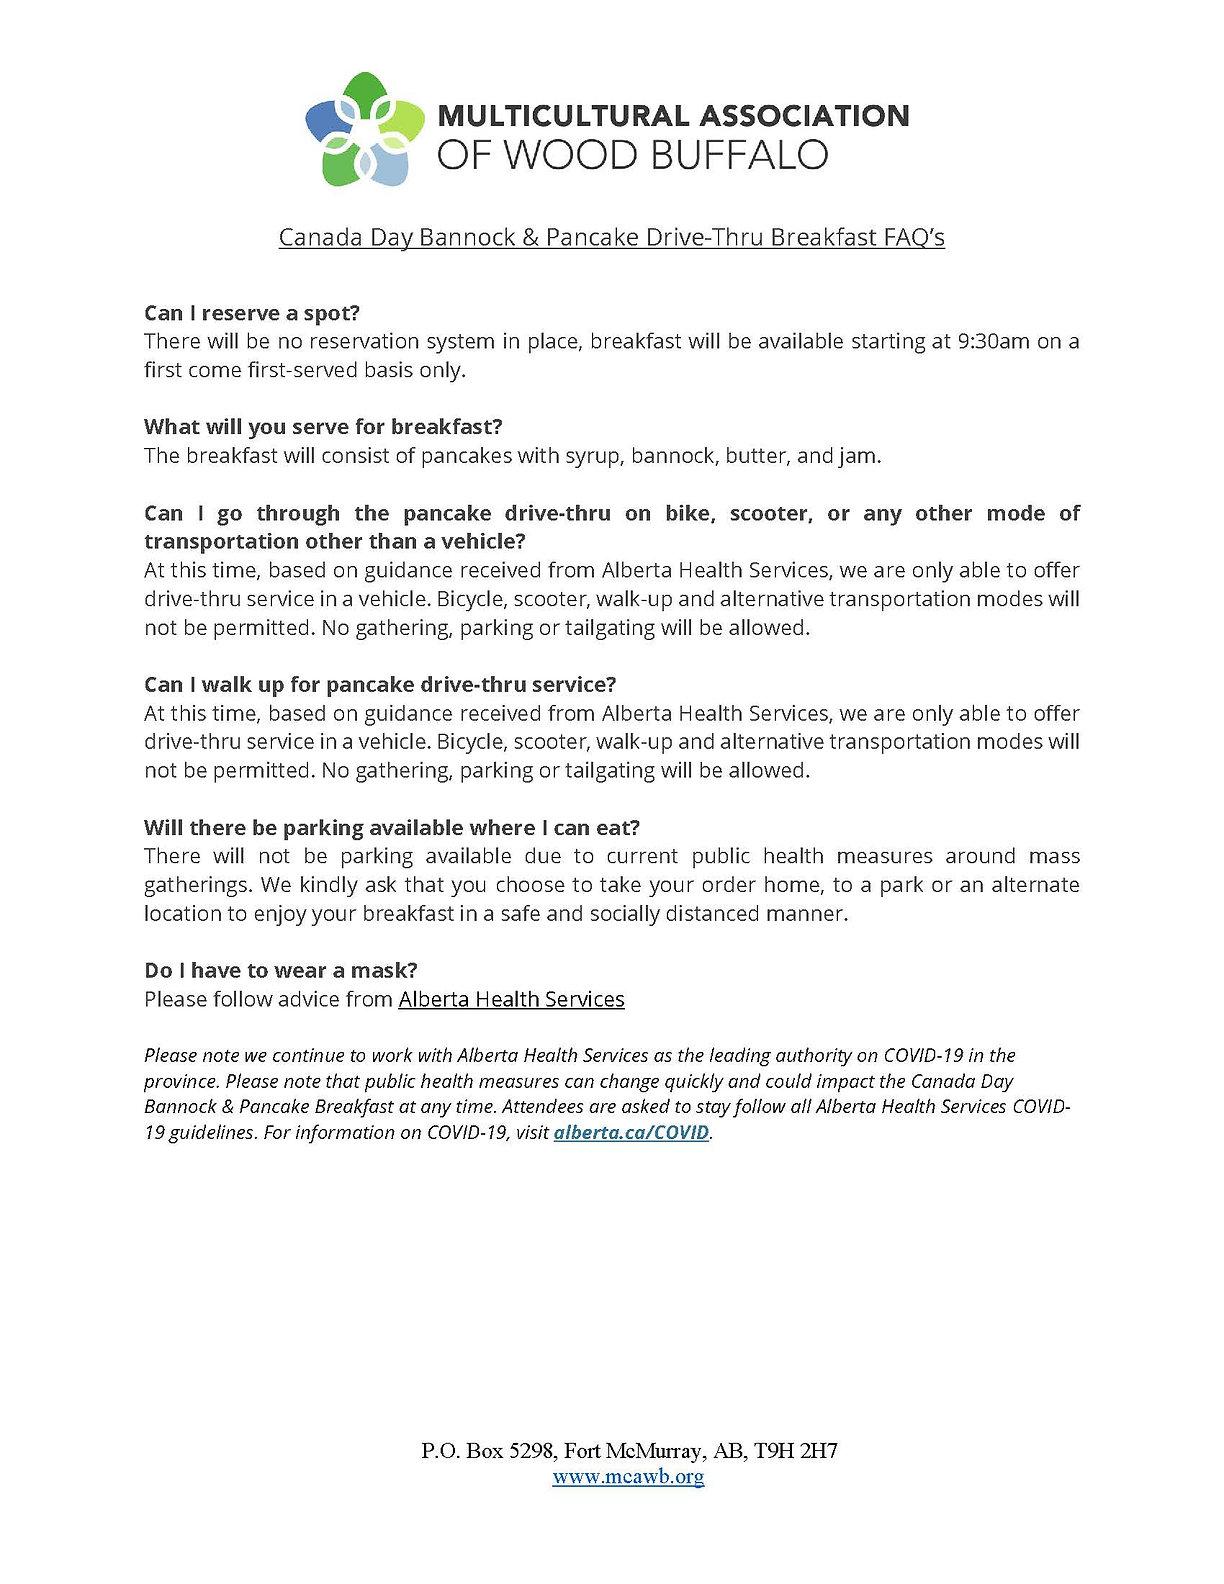 Canada Day FAQ's.jpg